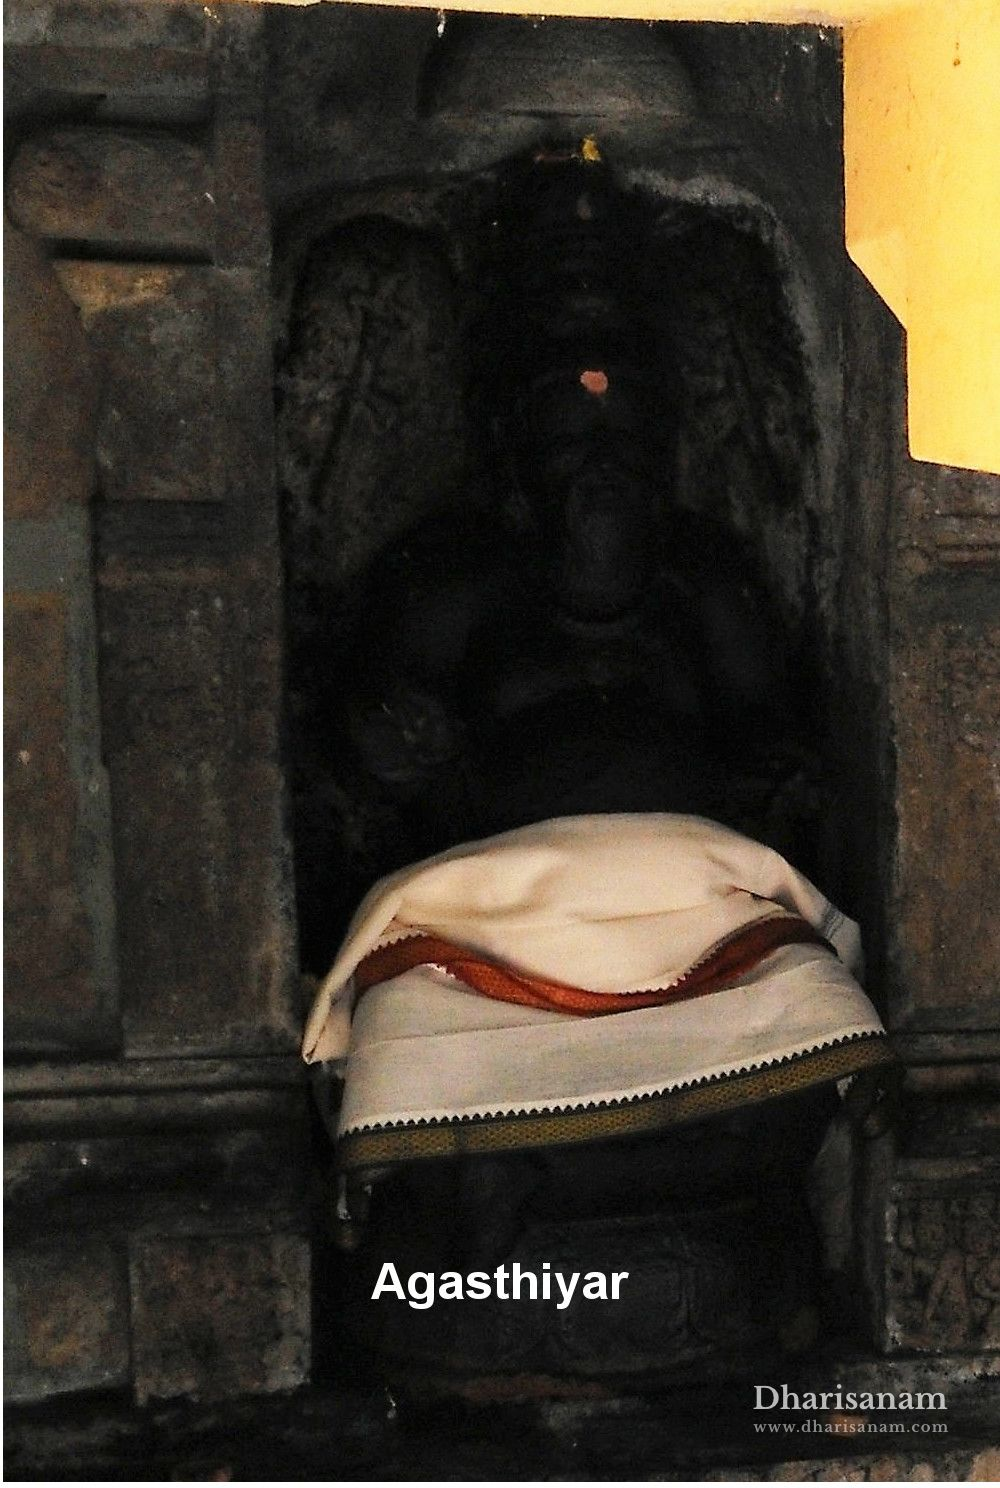 Sri Kodeeswarar temple at Thirukkodikkaval - Dharisanam